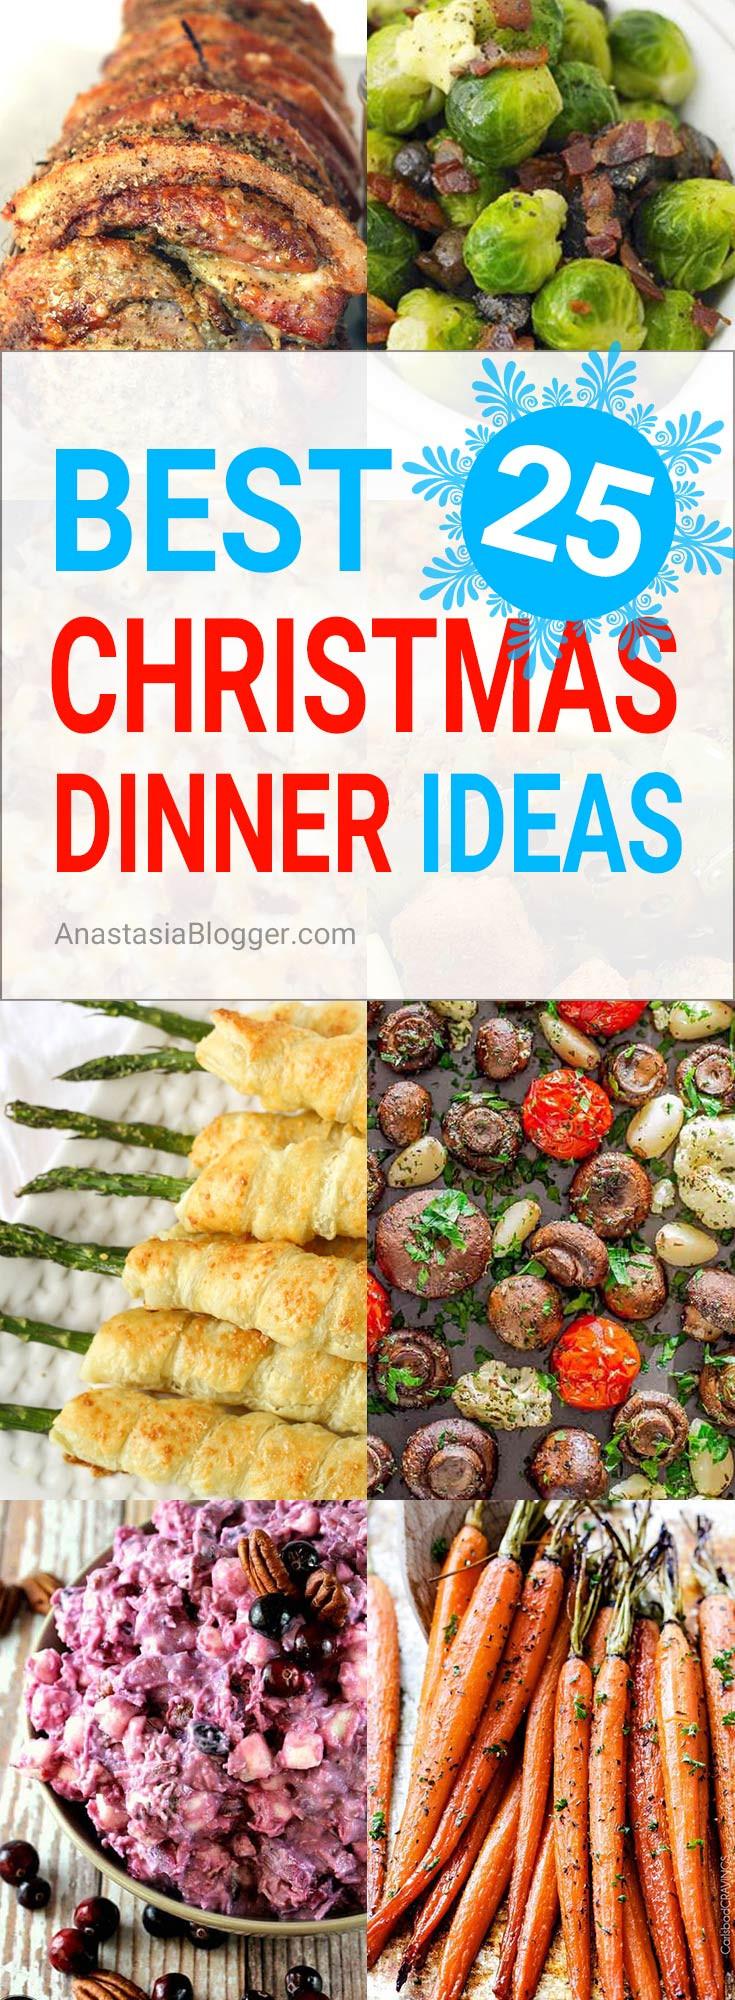 Christmas Dinner Party Menu Ideas  Best 25 Christmas Dinner Ideas Traditional Italian